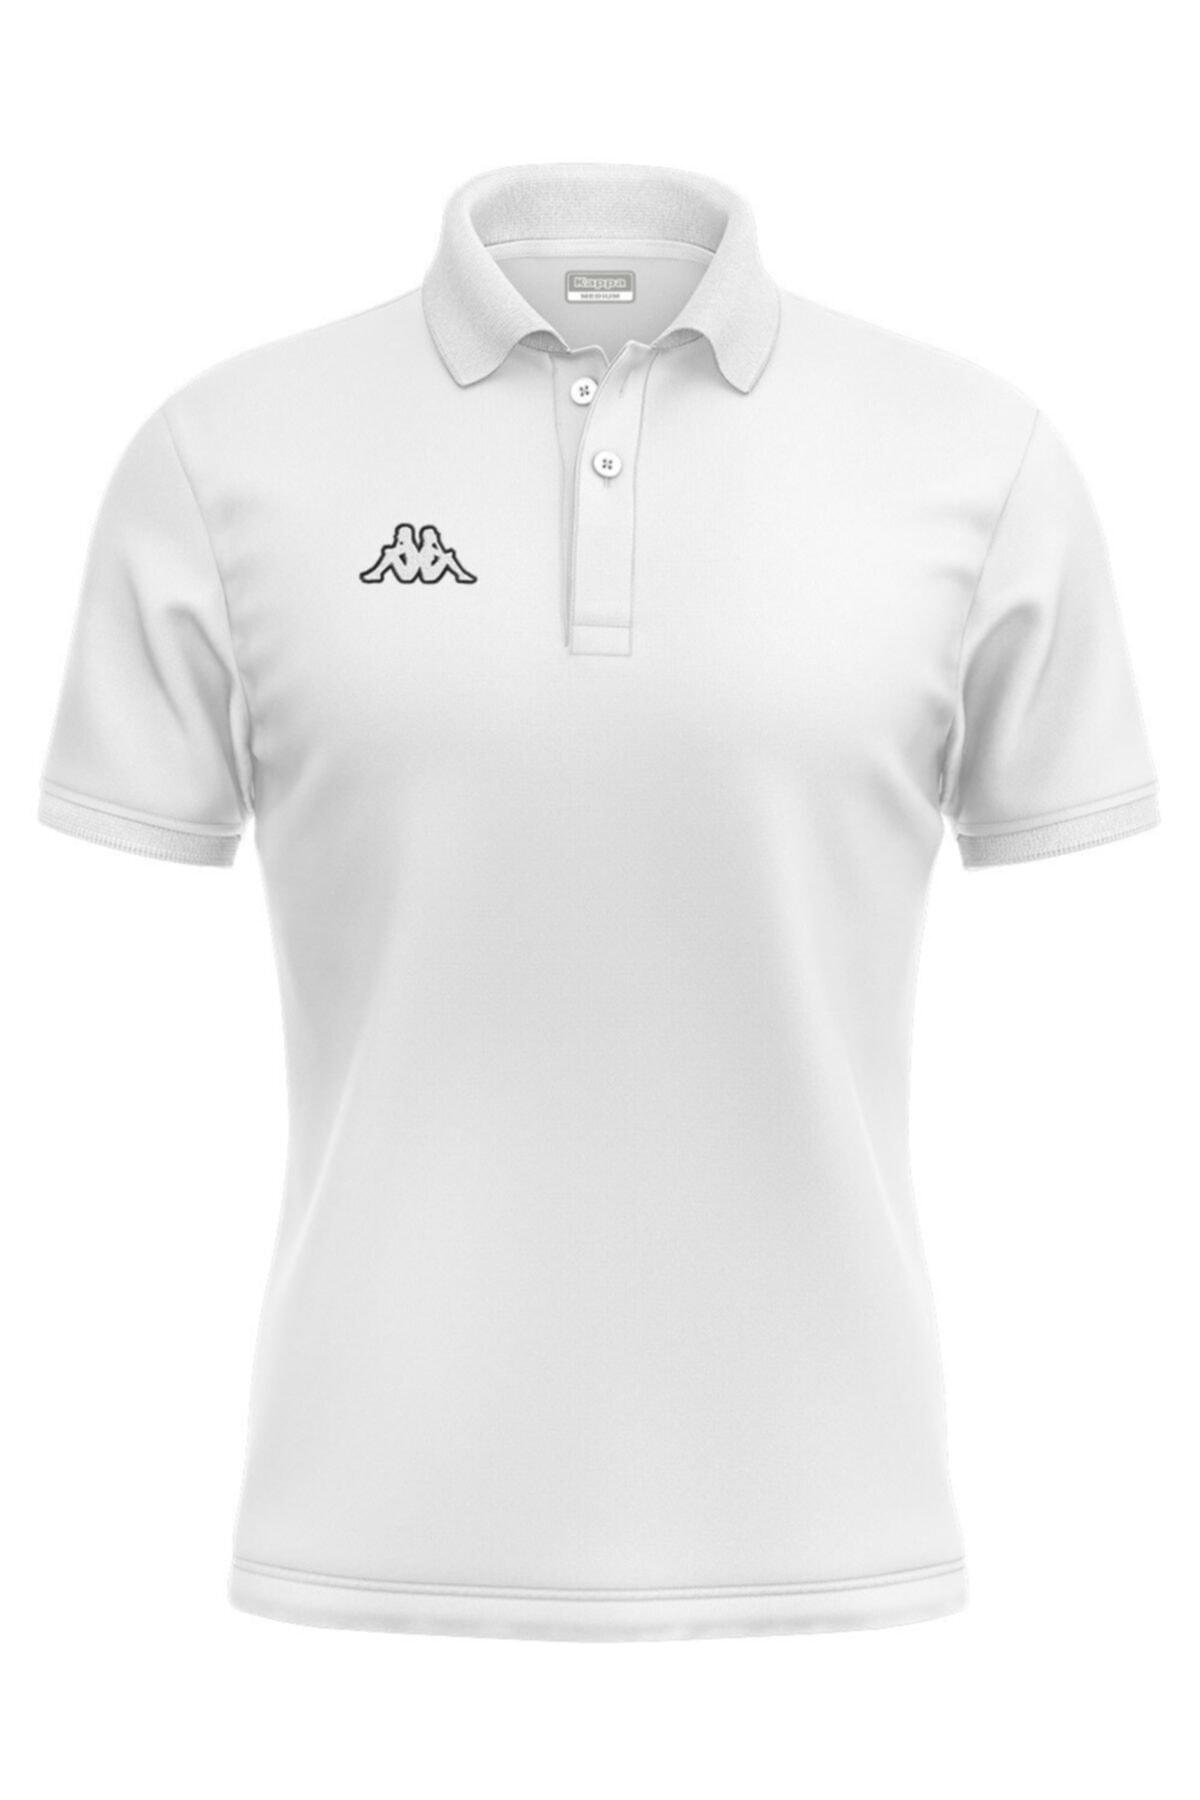 Kappa Kadın Beyaz Hege Polo Tshirt 1